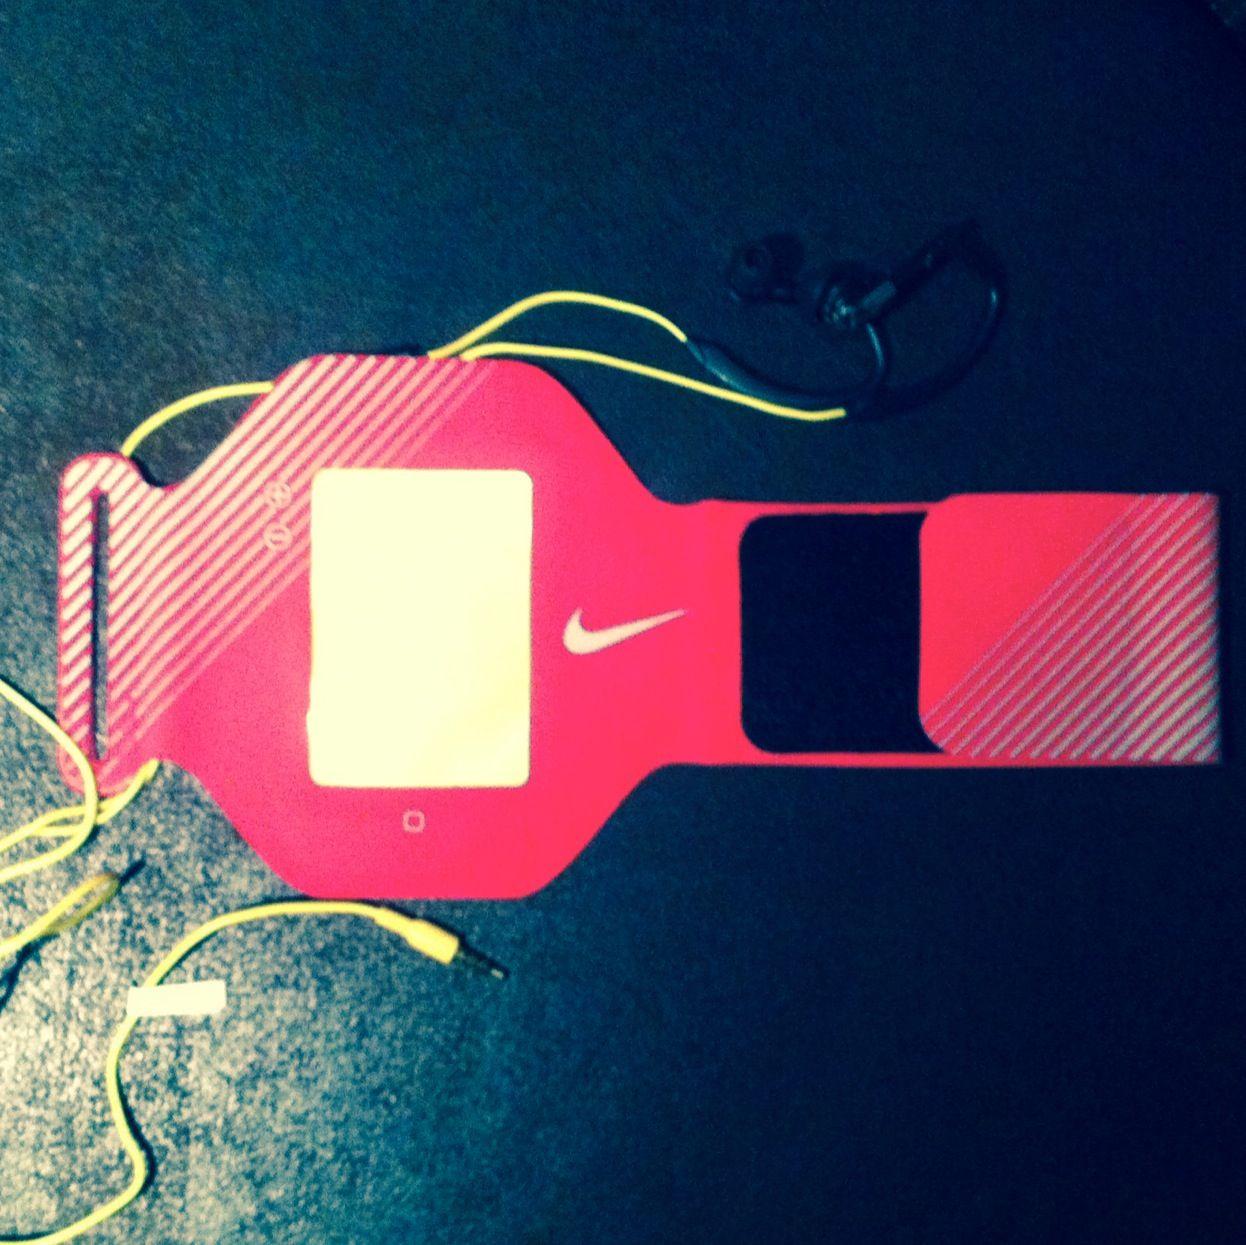 My pink nike armband and headphones gym life arm